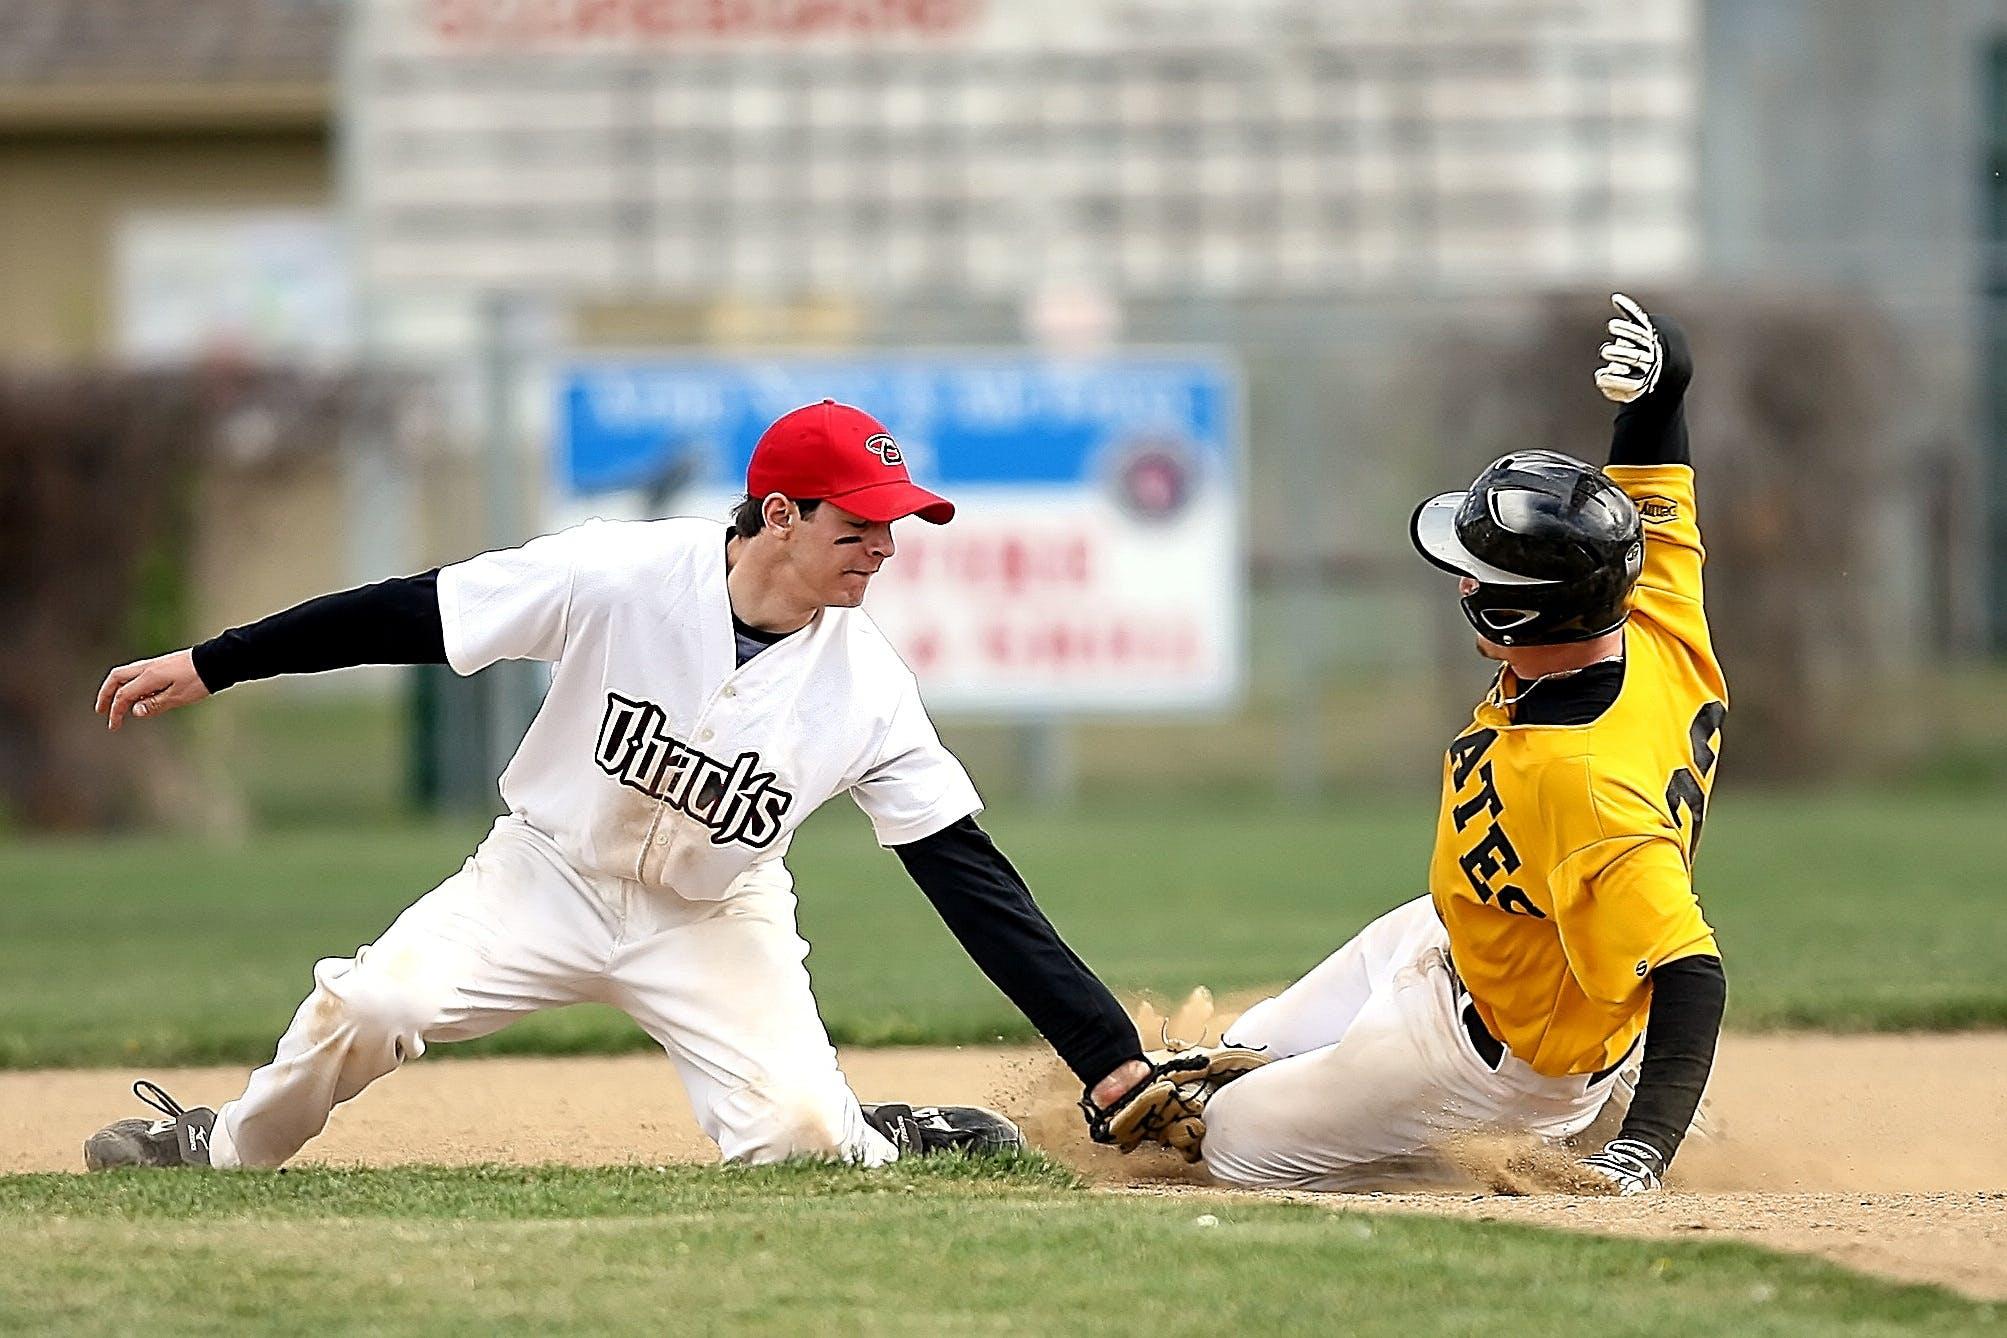 Kostenloses Stock Foto zu athleten, baseball, baseball-spieler, feld